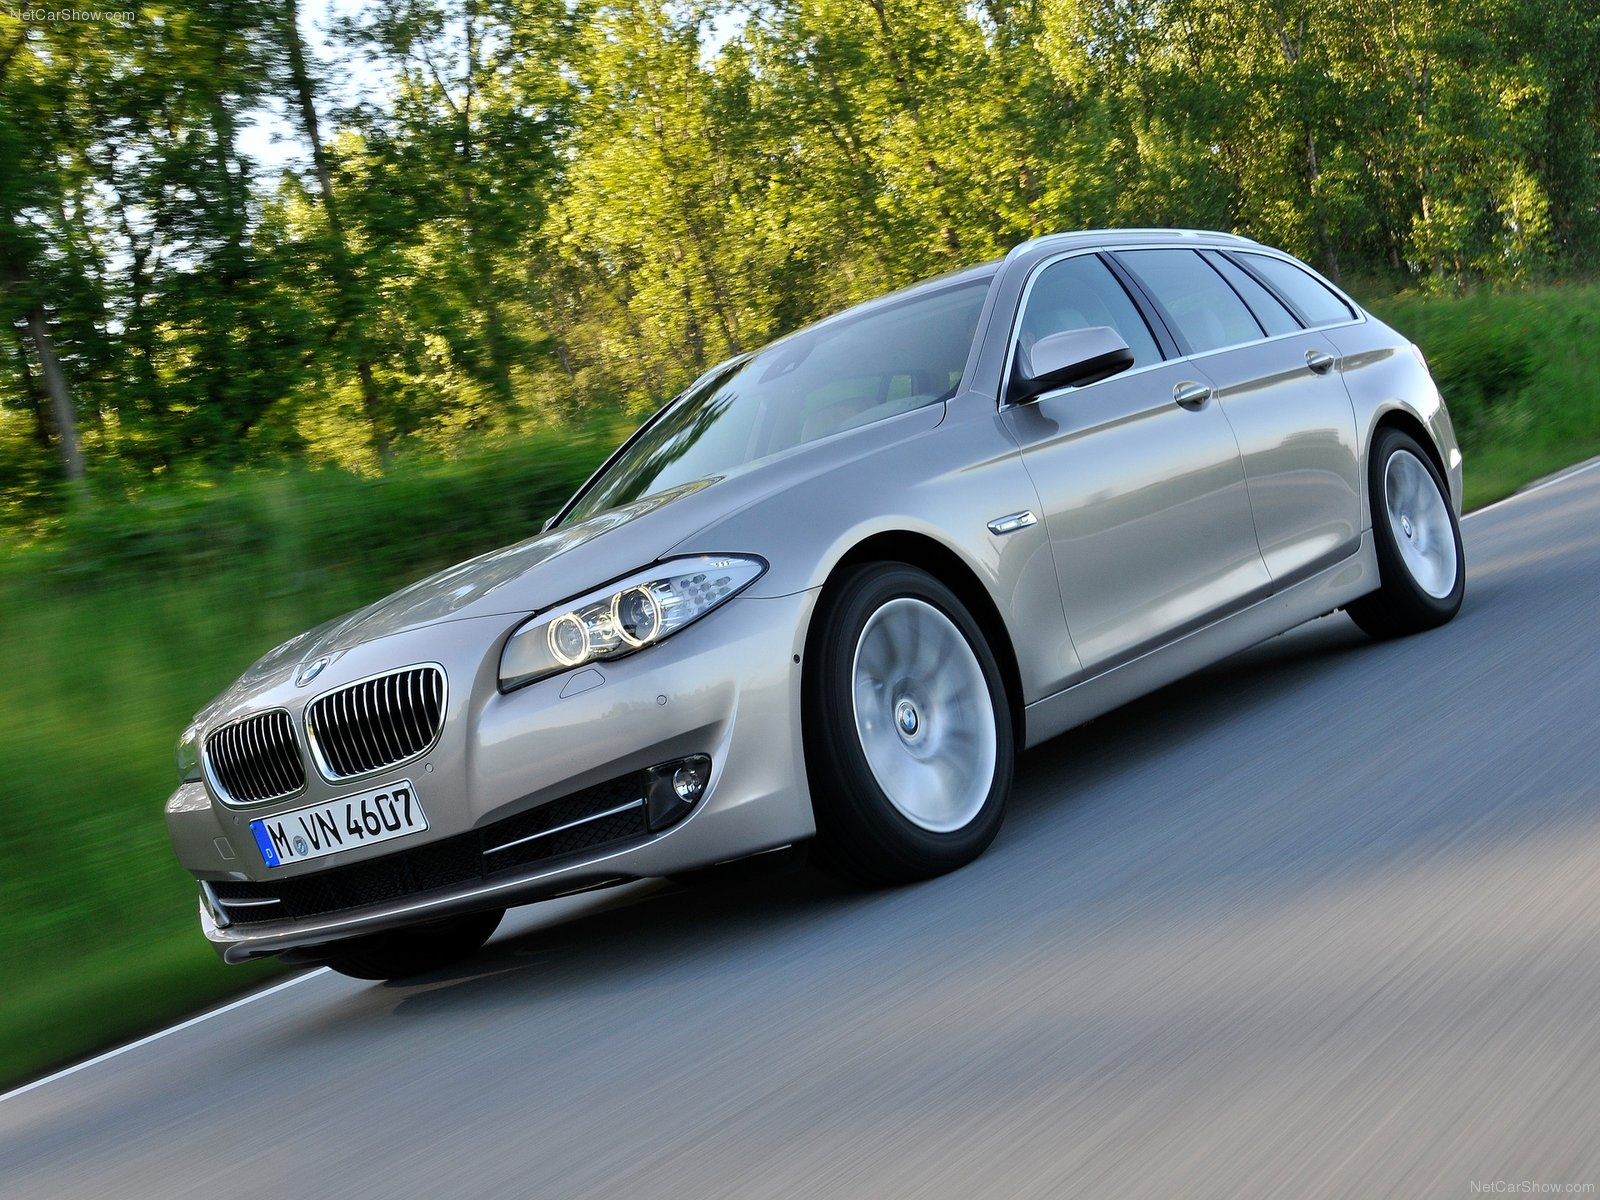 Auto Opinião: BMW 520d 2011 Touring - Análise